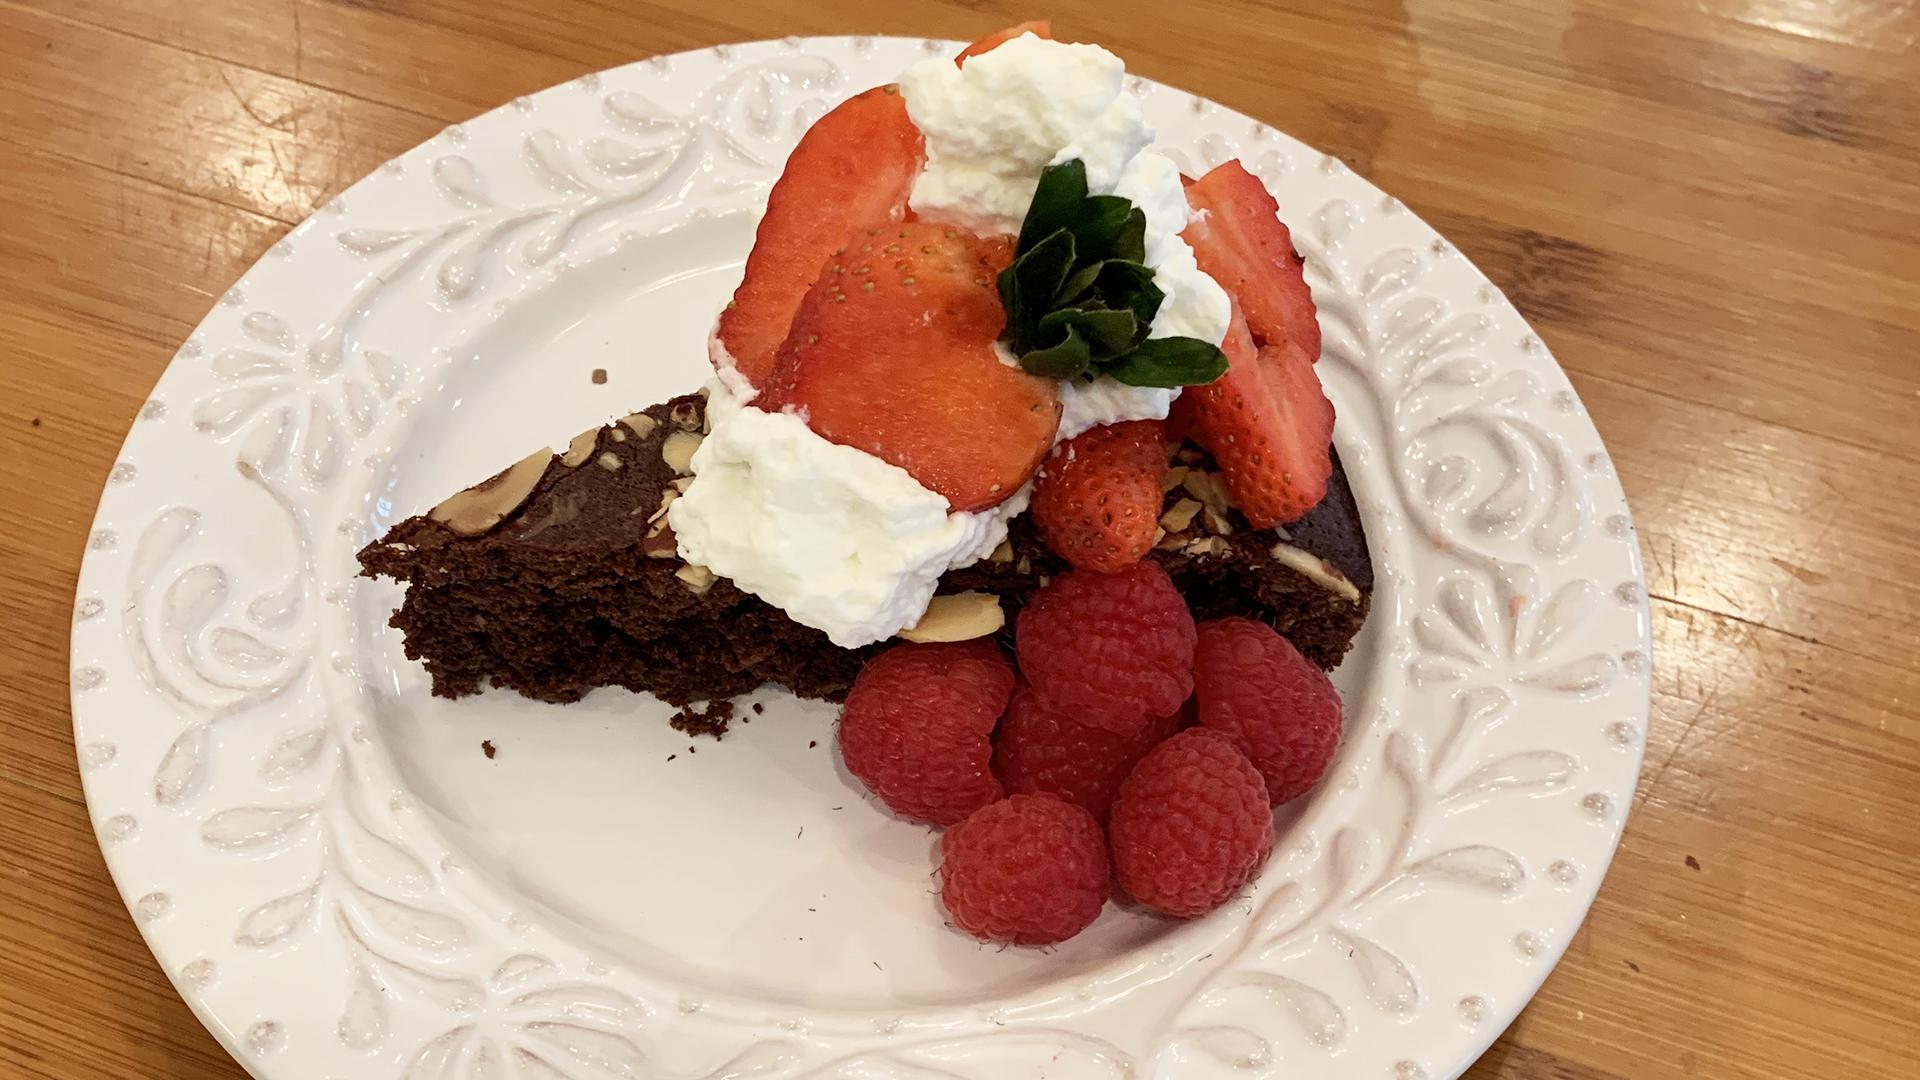 Chocolate Almond Torte With Berries | Rachael's Sister Maria